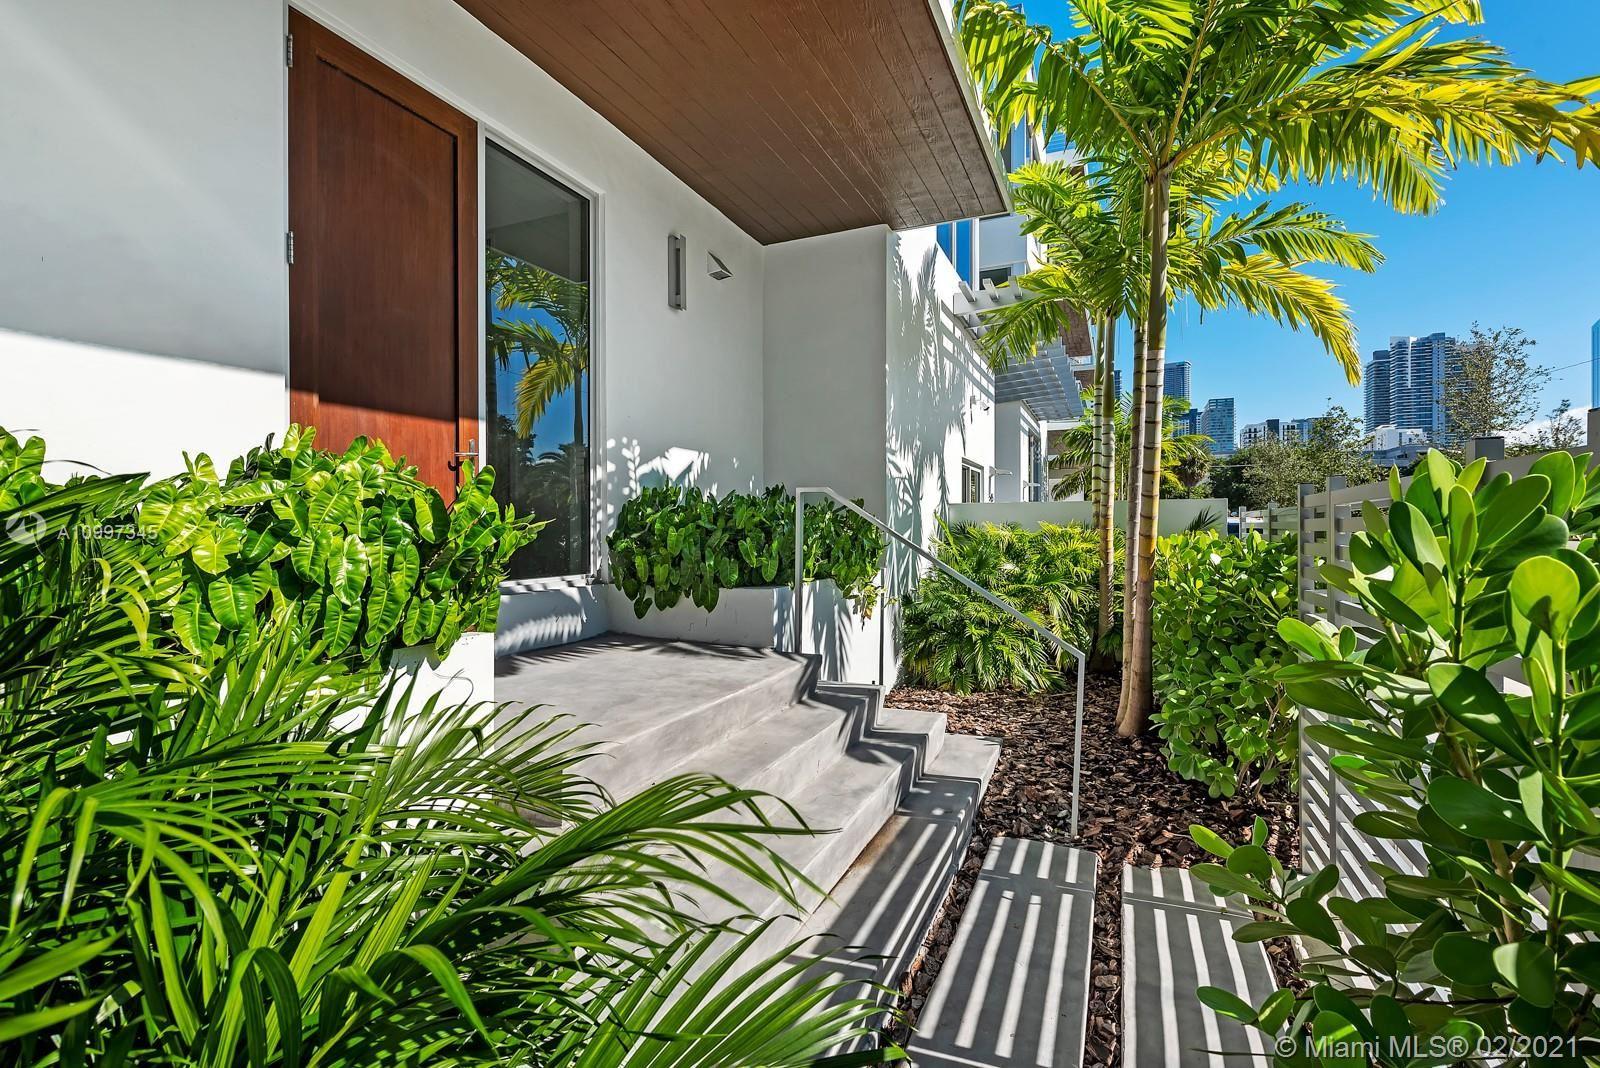 545 SW 11TH STREET #105, Miami, FL 33129 - #: A10997345